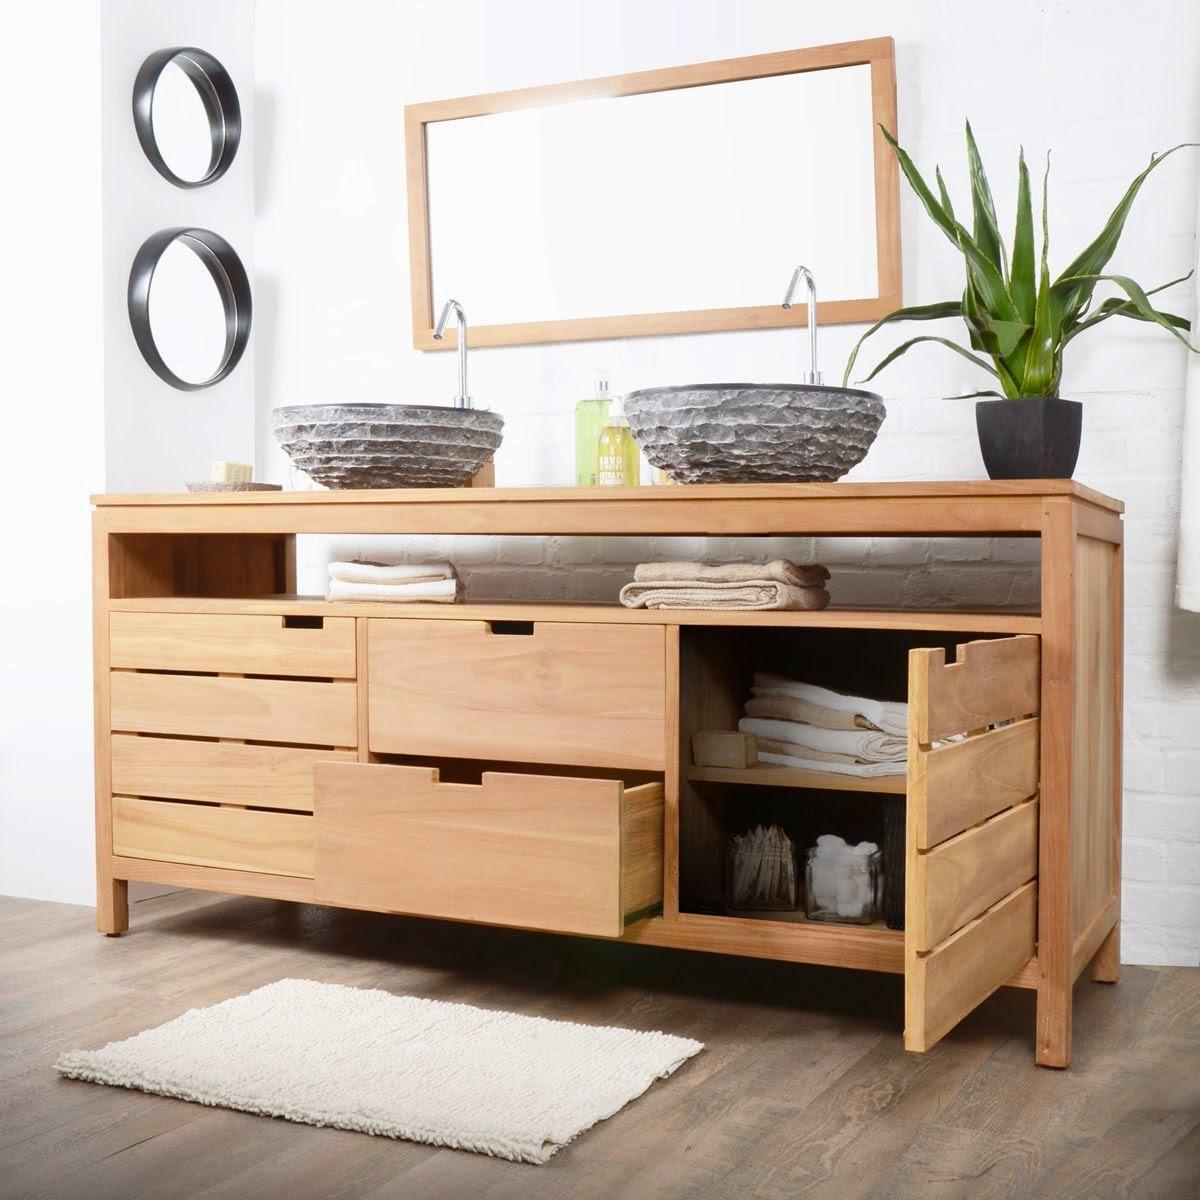 Meuble de salle de bain en bois meuble d coration maison for Salle de bain 06